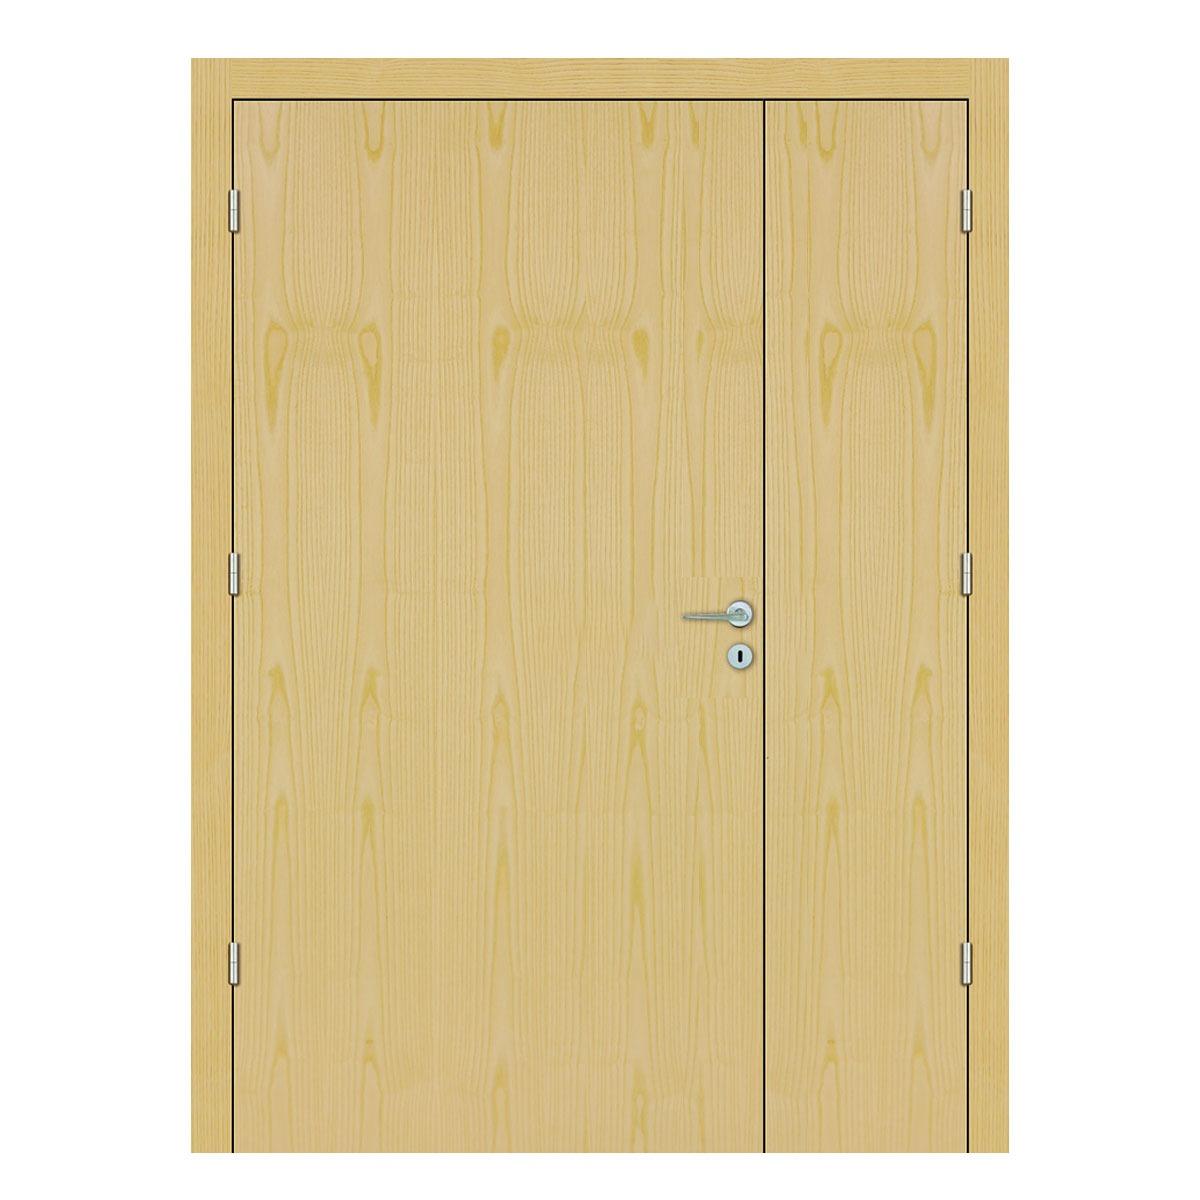 Ash Hospital Doors